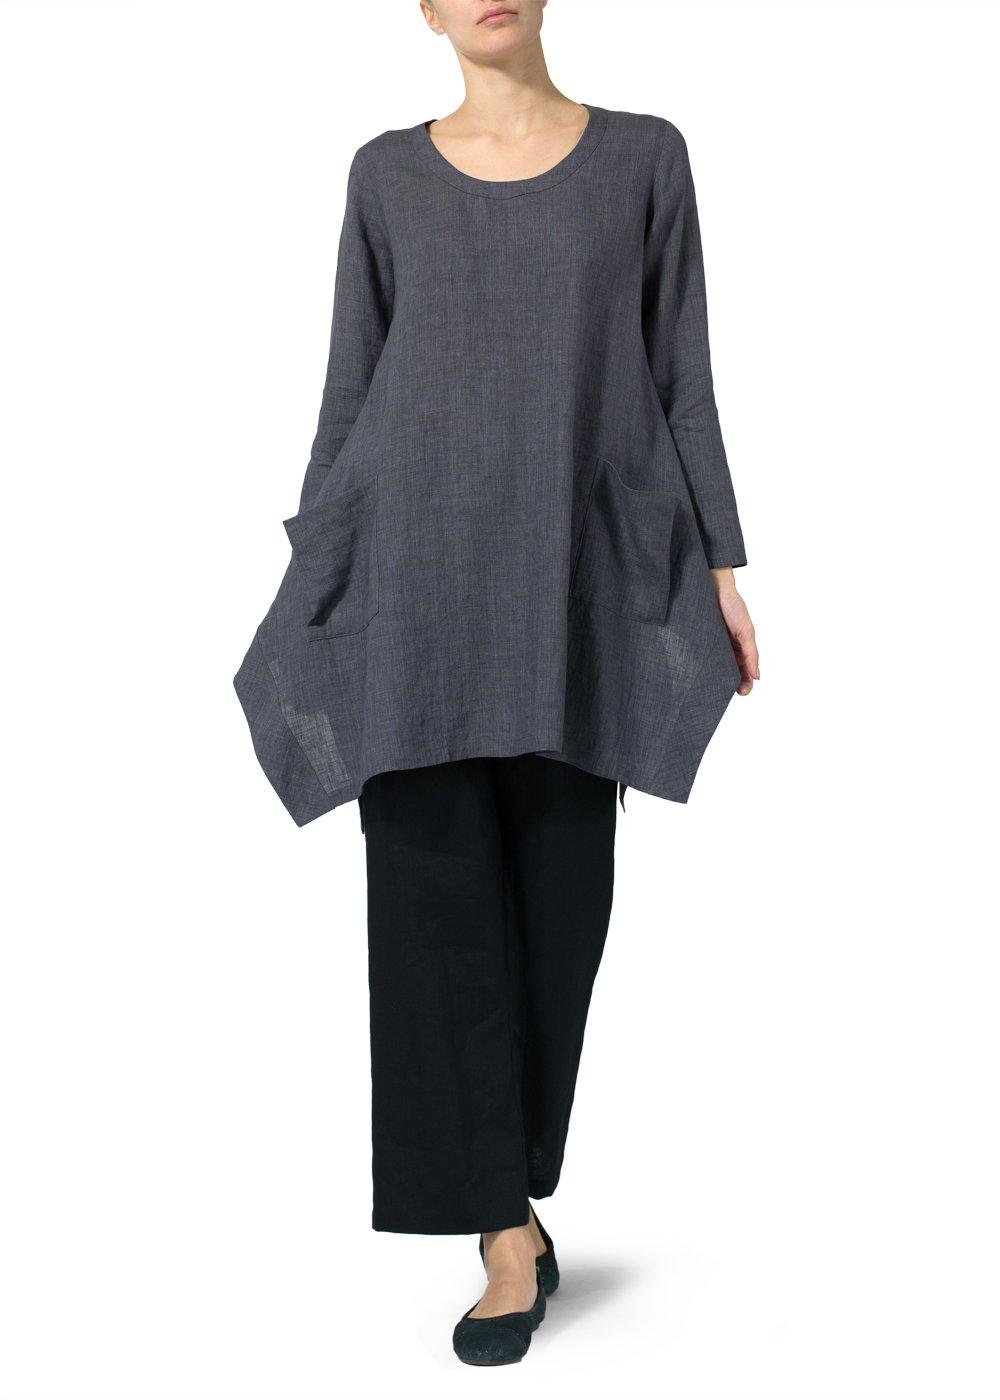 Vivid Linen Long Sleeve Top-4X-Smokey Gray